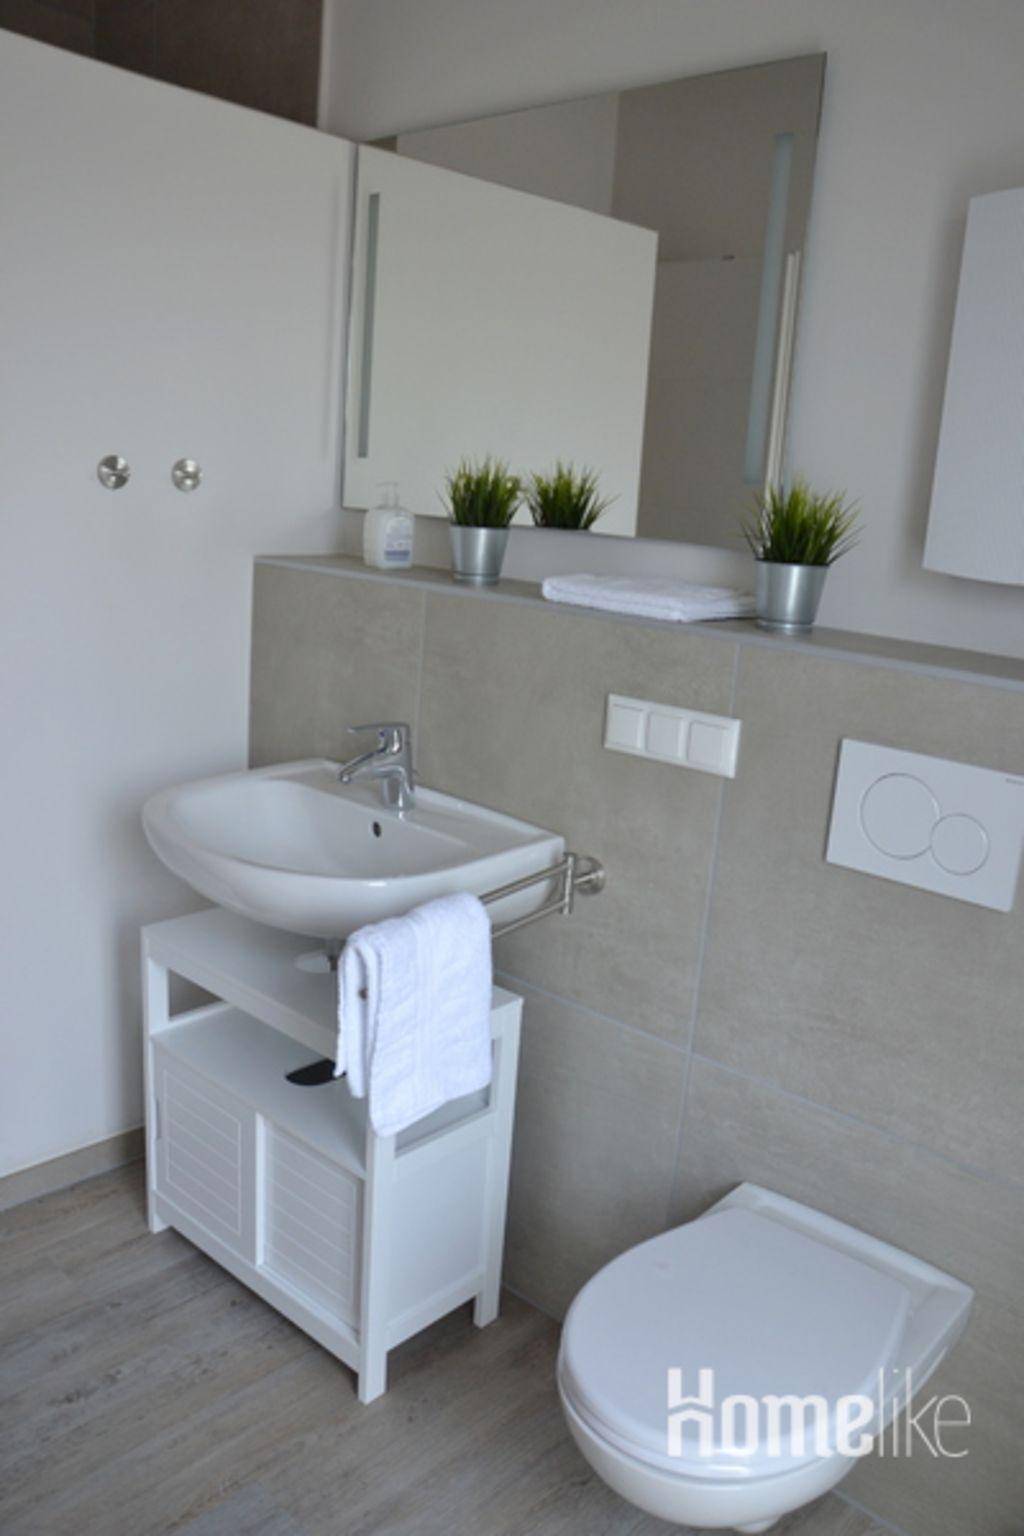 image 8 furnished 1 bedroom Apartment for rent in Rommerskirchen, Rhein-Kreis Neuss